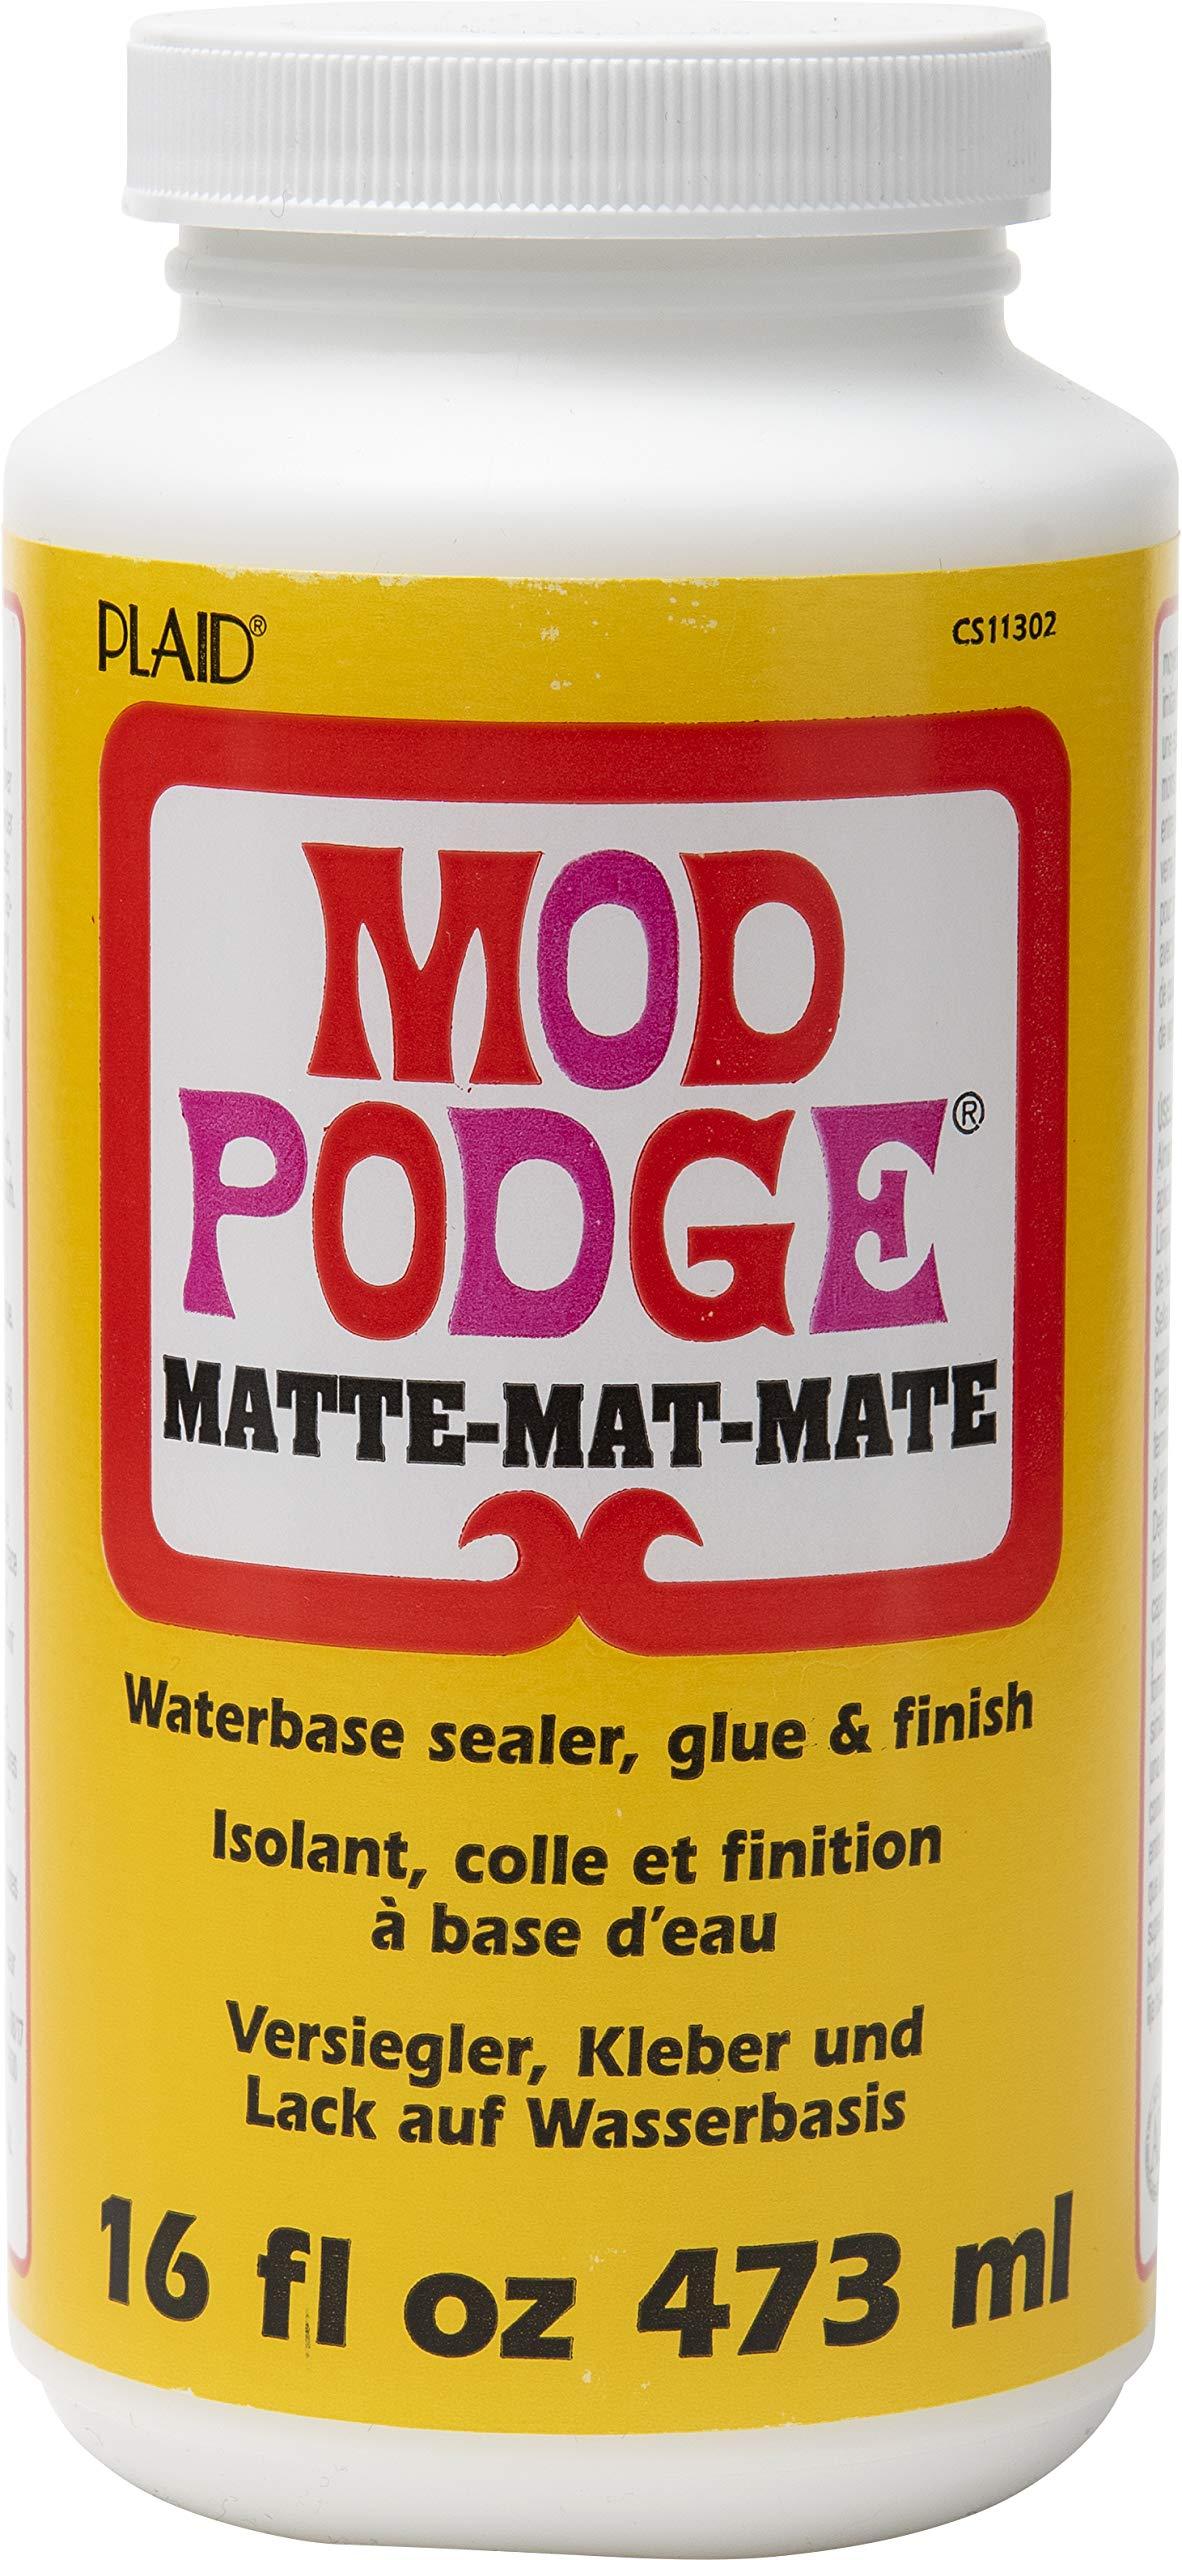 Mod Podge CS11302 Waterbase Sealer, Glue and Finish, 16 oz, Matte, 16 Ounce                Mod Podge CS11203 Waterbase Sealer, Glue & Decoupage Finish, 32 oz, Gloss                Mod Podge CS15092 Waterbase Sealer, Glue & Decoupage Finish, 64 oz, Matte